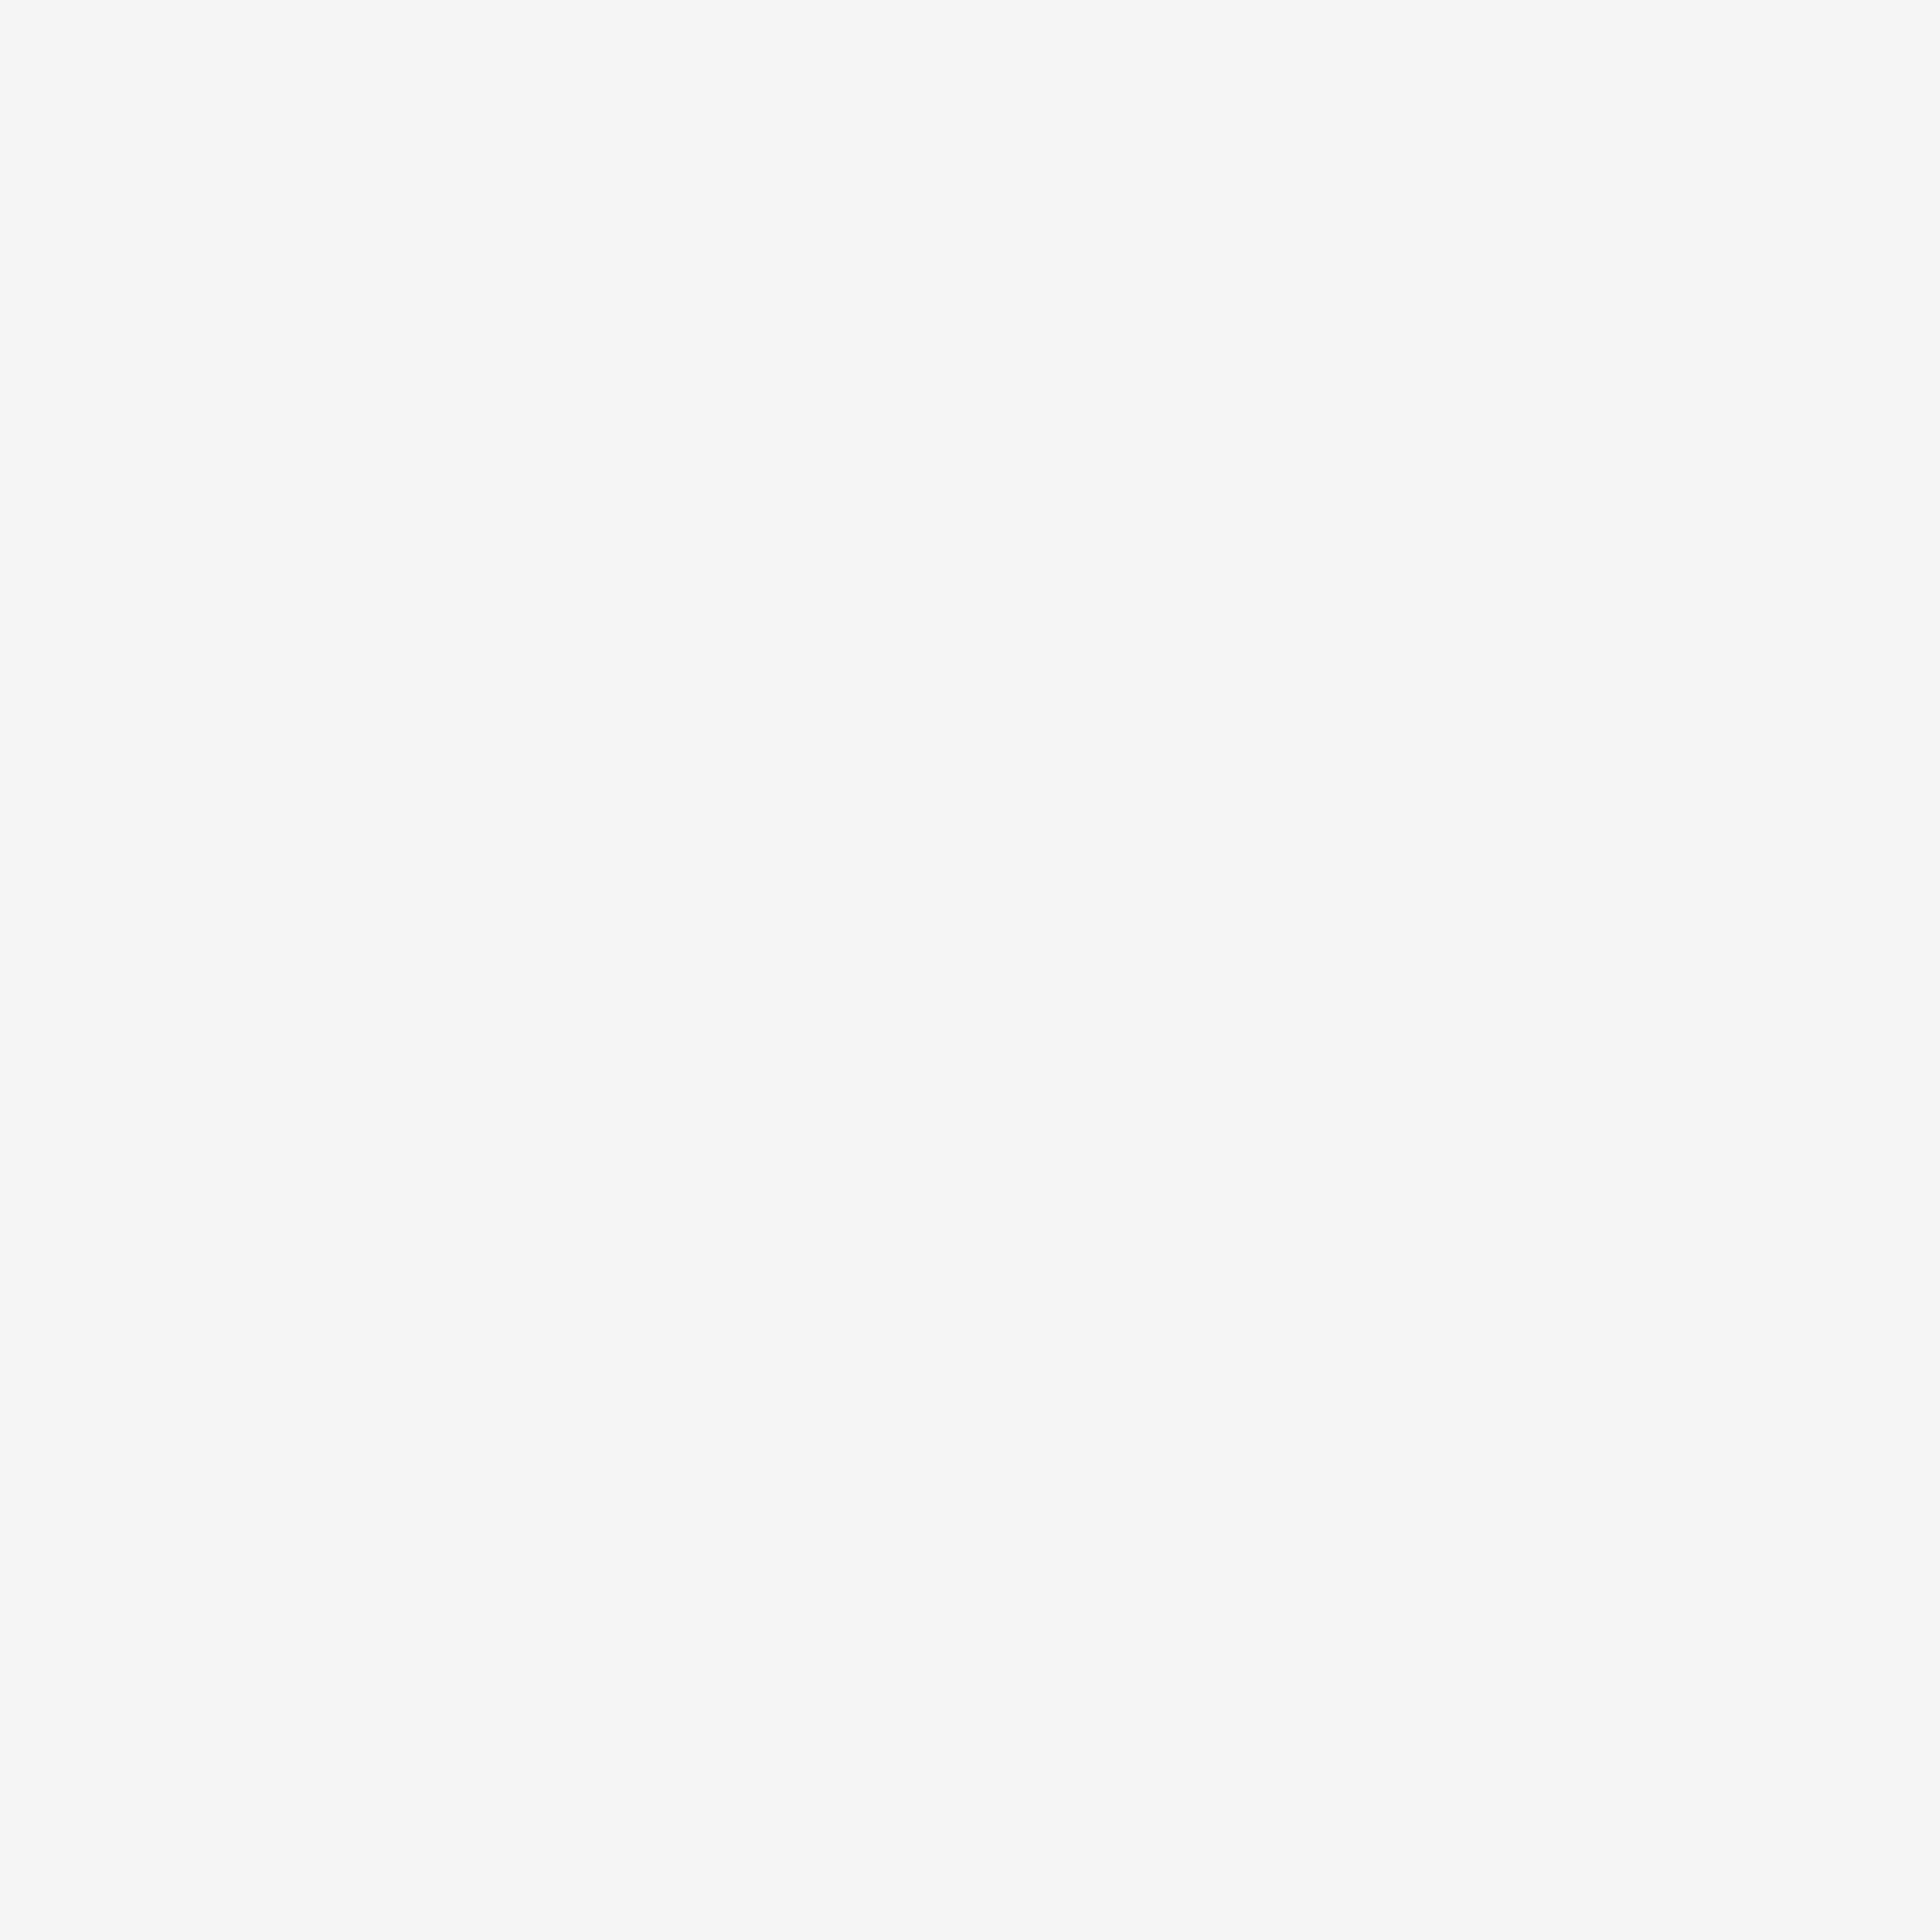 adidas juventus trainingsshirt junior 2020 2021 shirts polo s fanshop voetbal intersport van den broek biggelaar adidas